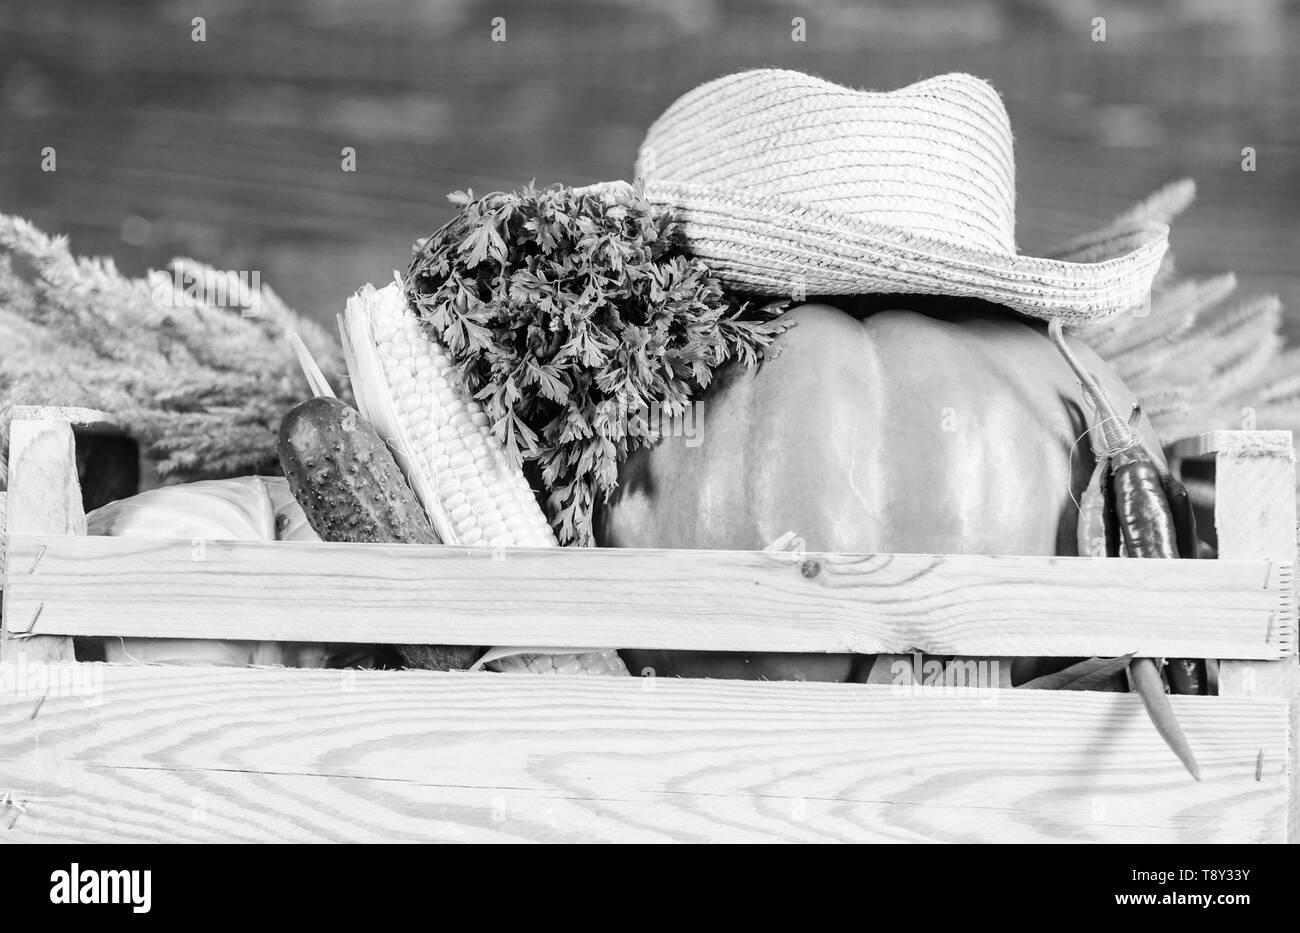 Buy fresh homegrown vegetables. Box or basket harvest vegetables wooden background. Excellent quality vegetables. Just from garden. Grocery shop concept. Delivery service fresh vegetables from farm. - Stock Image